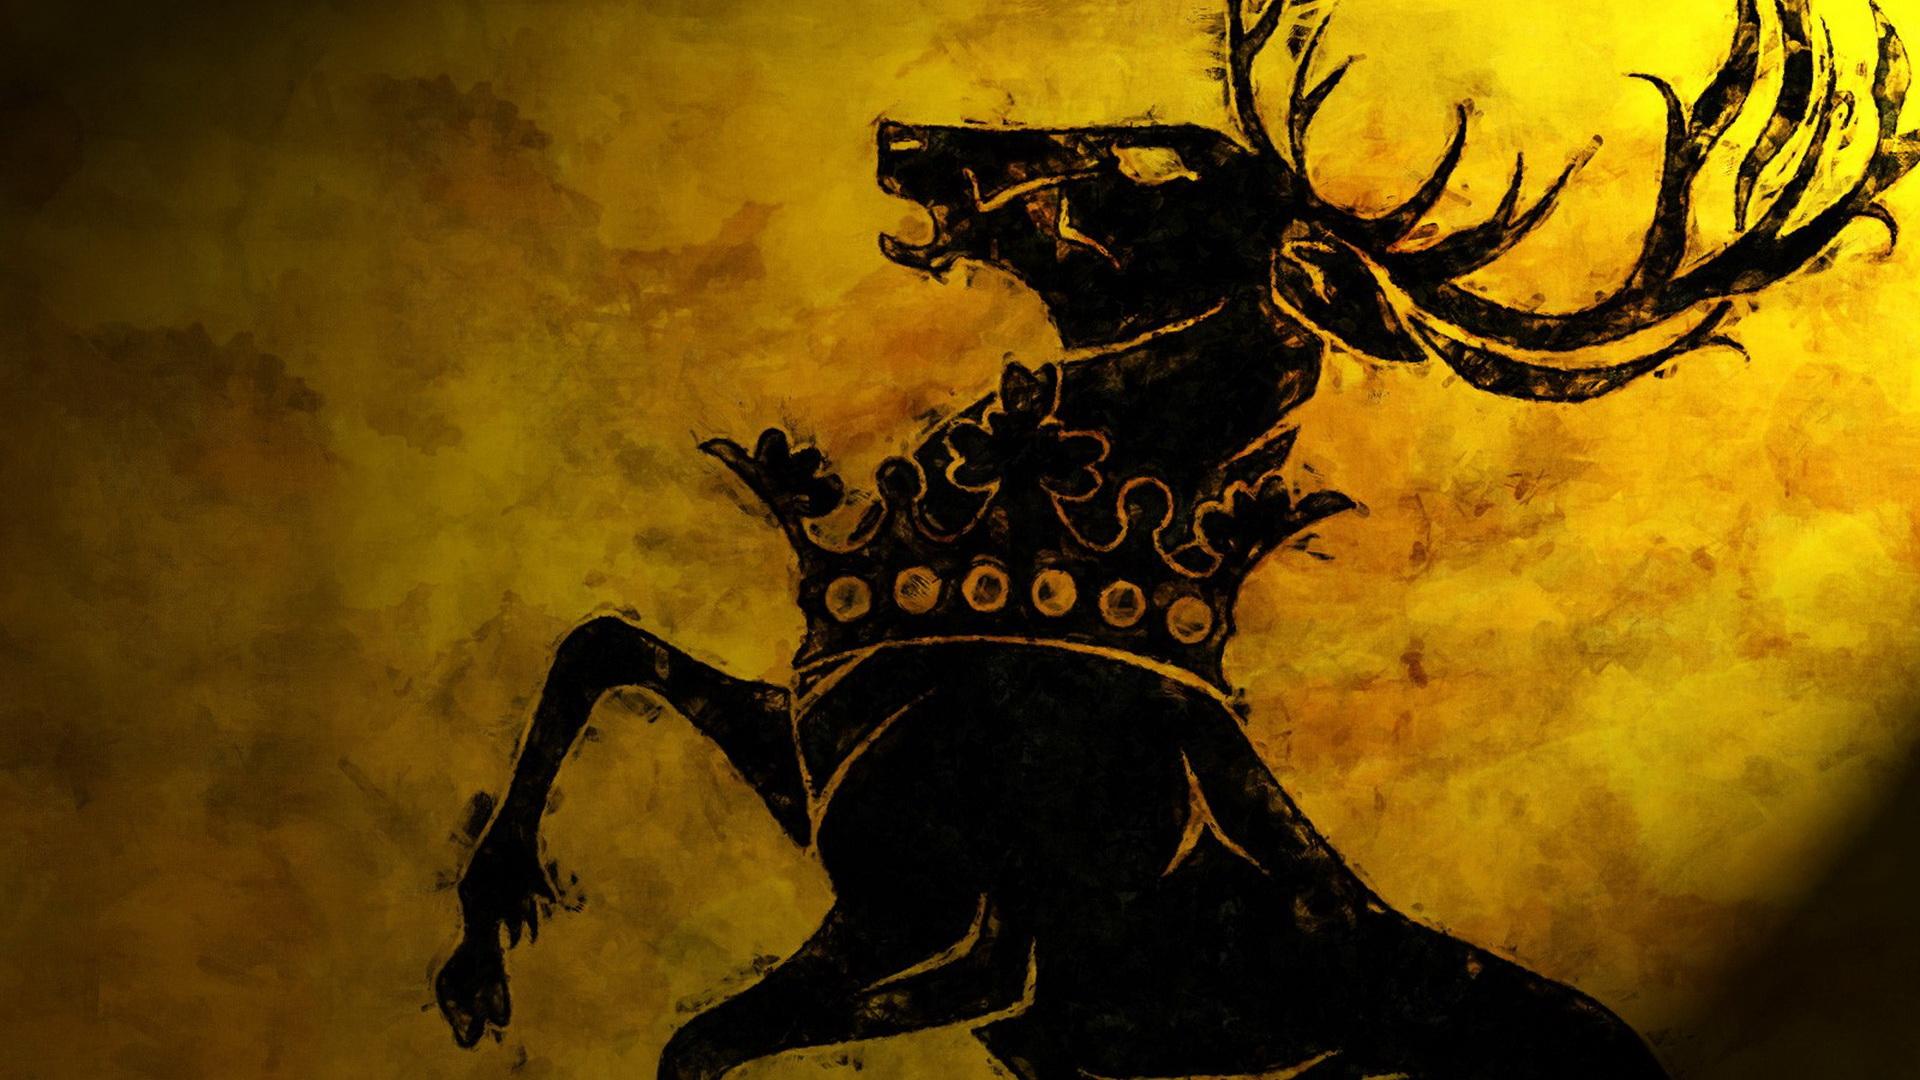 Game Of Thrones HD wallpapers [109-120] • PoPoPics.com